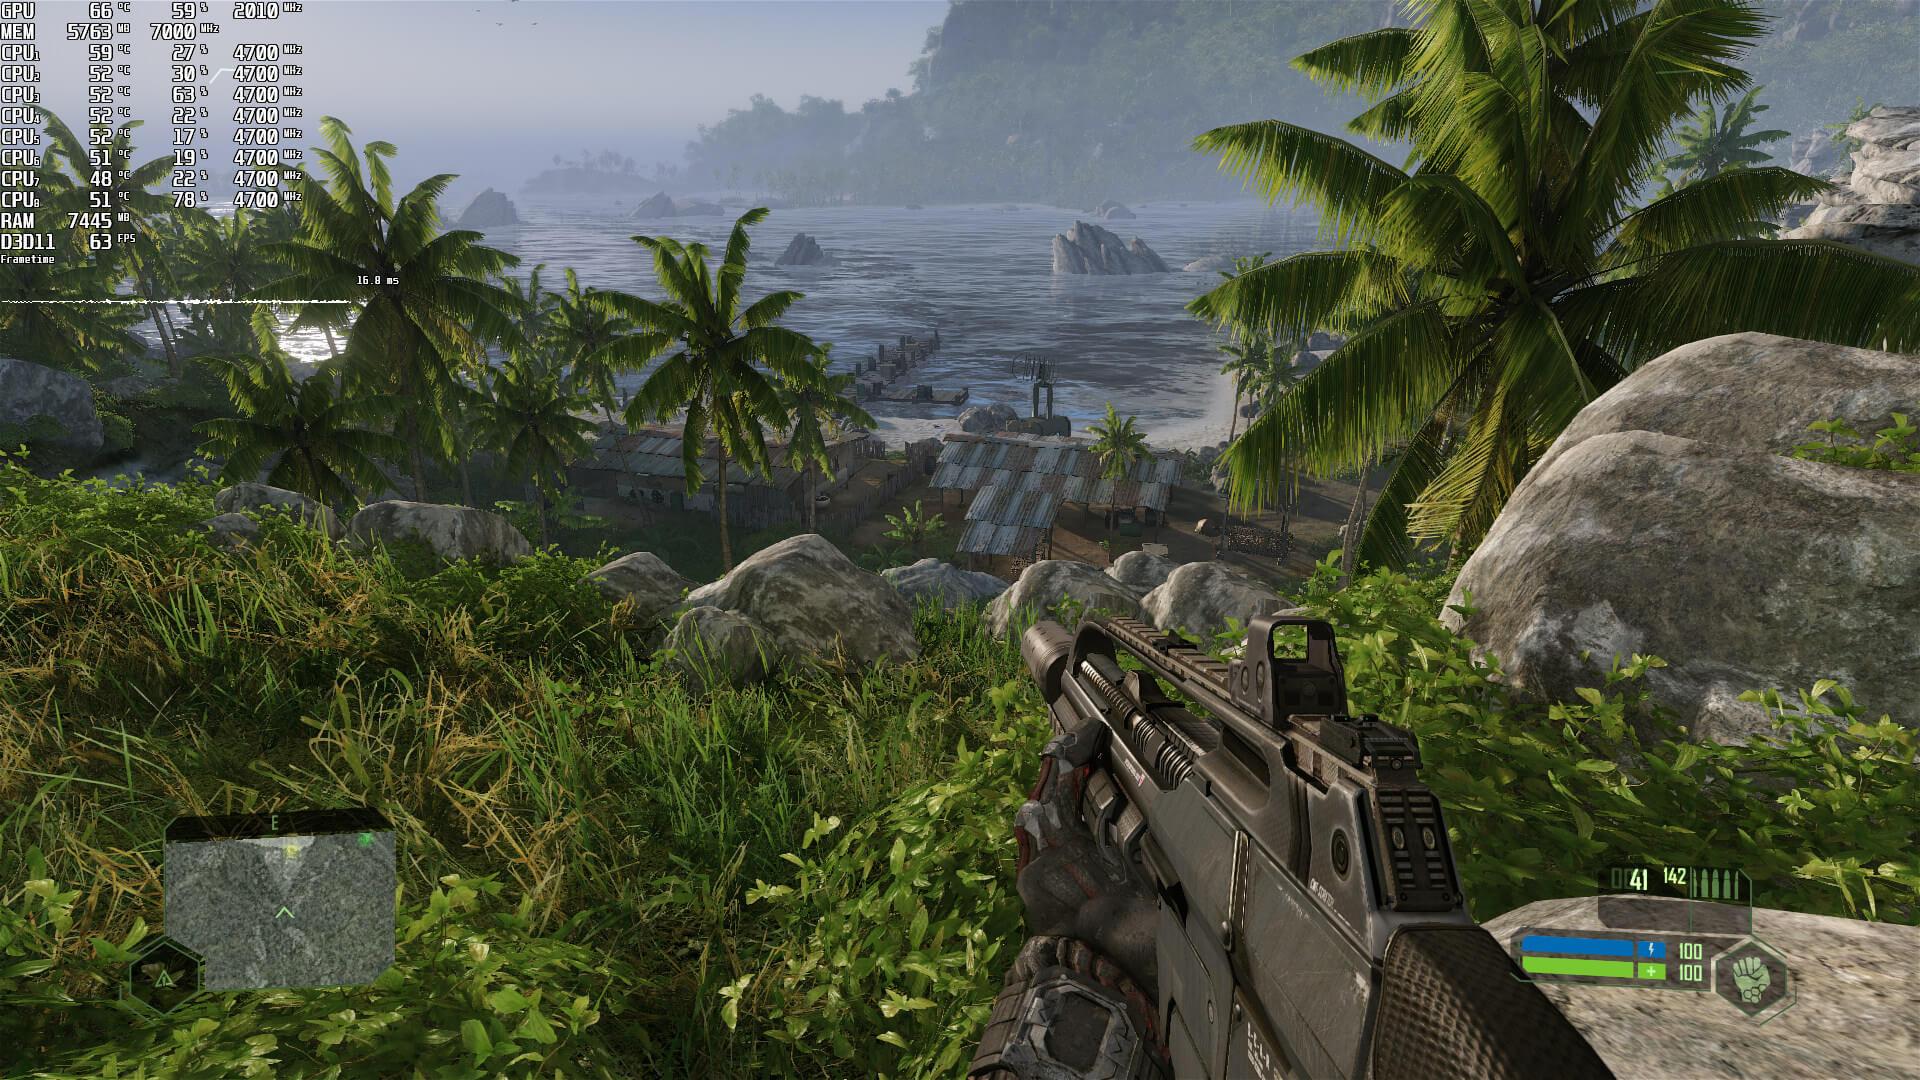 Crysis Remastered 1080p High Settings